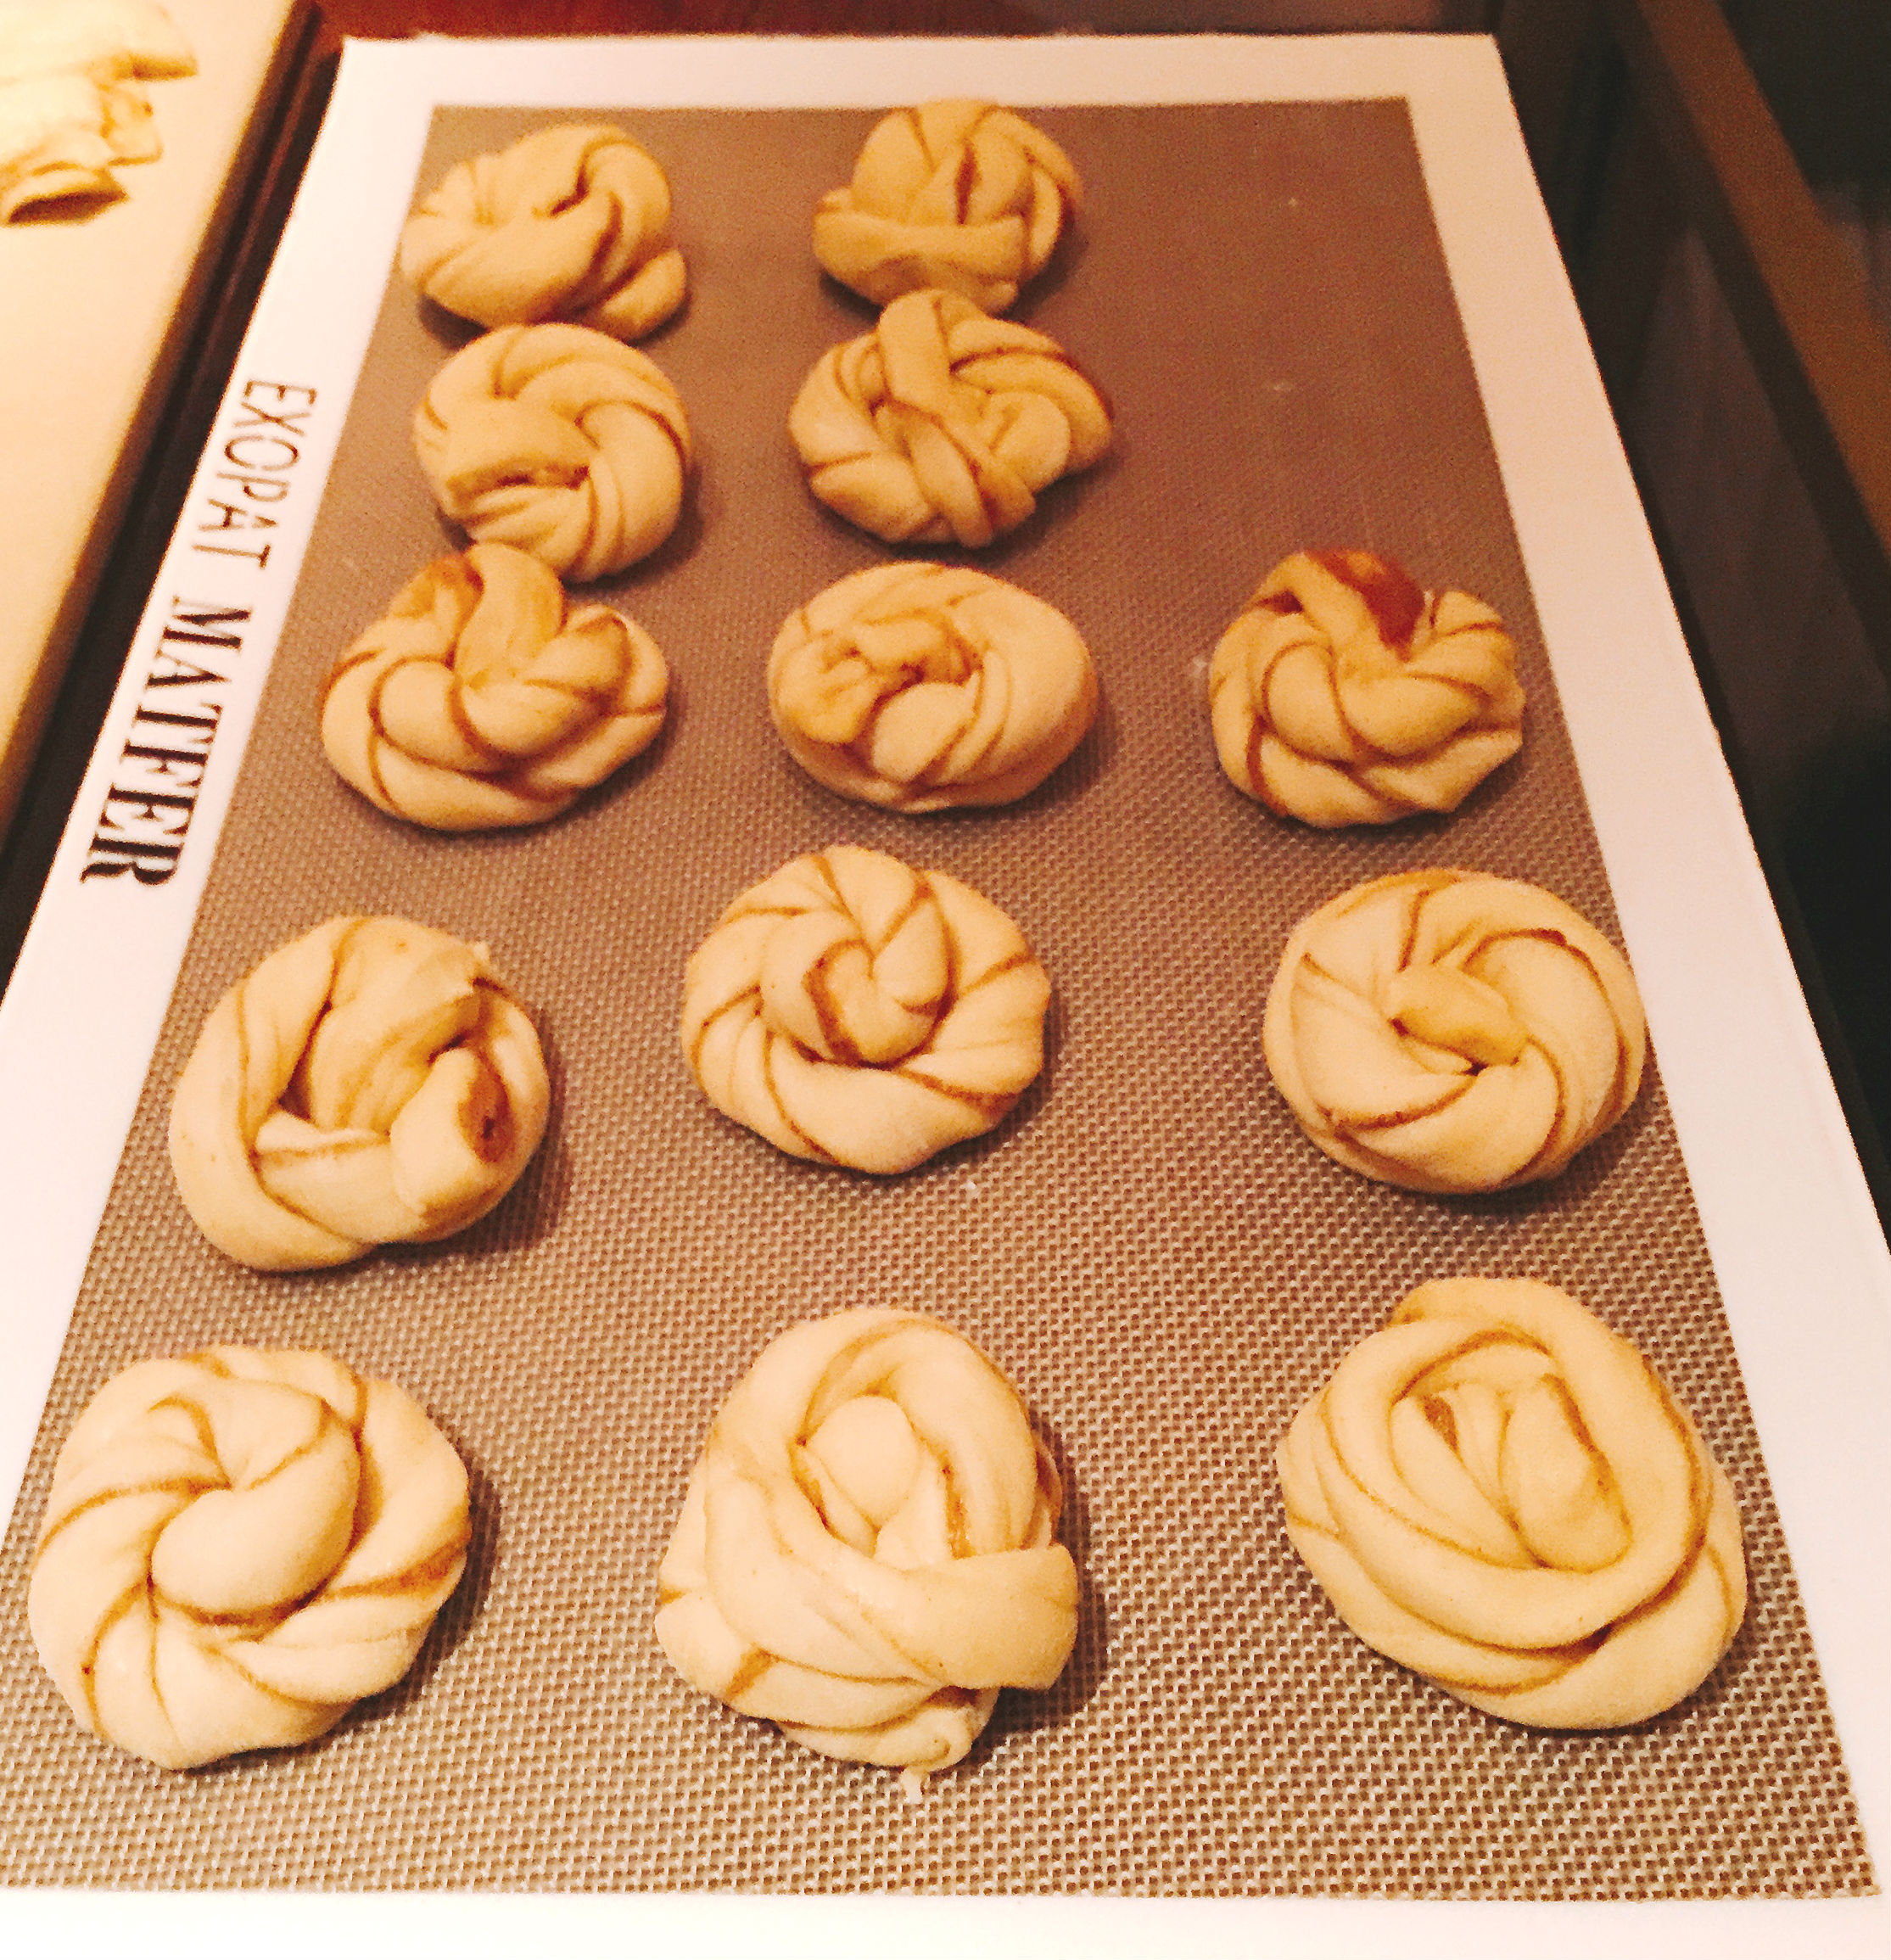 Aster Cinnamon buns